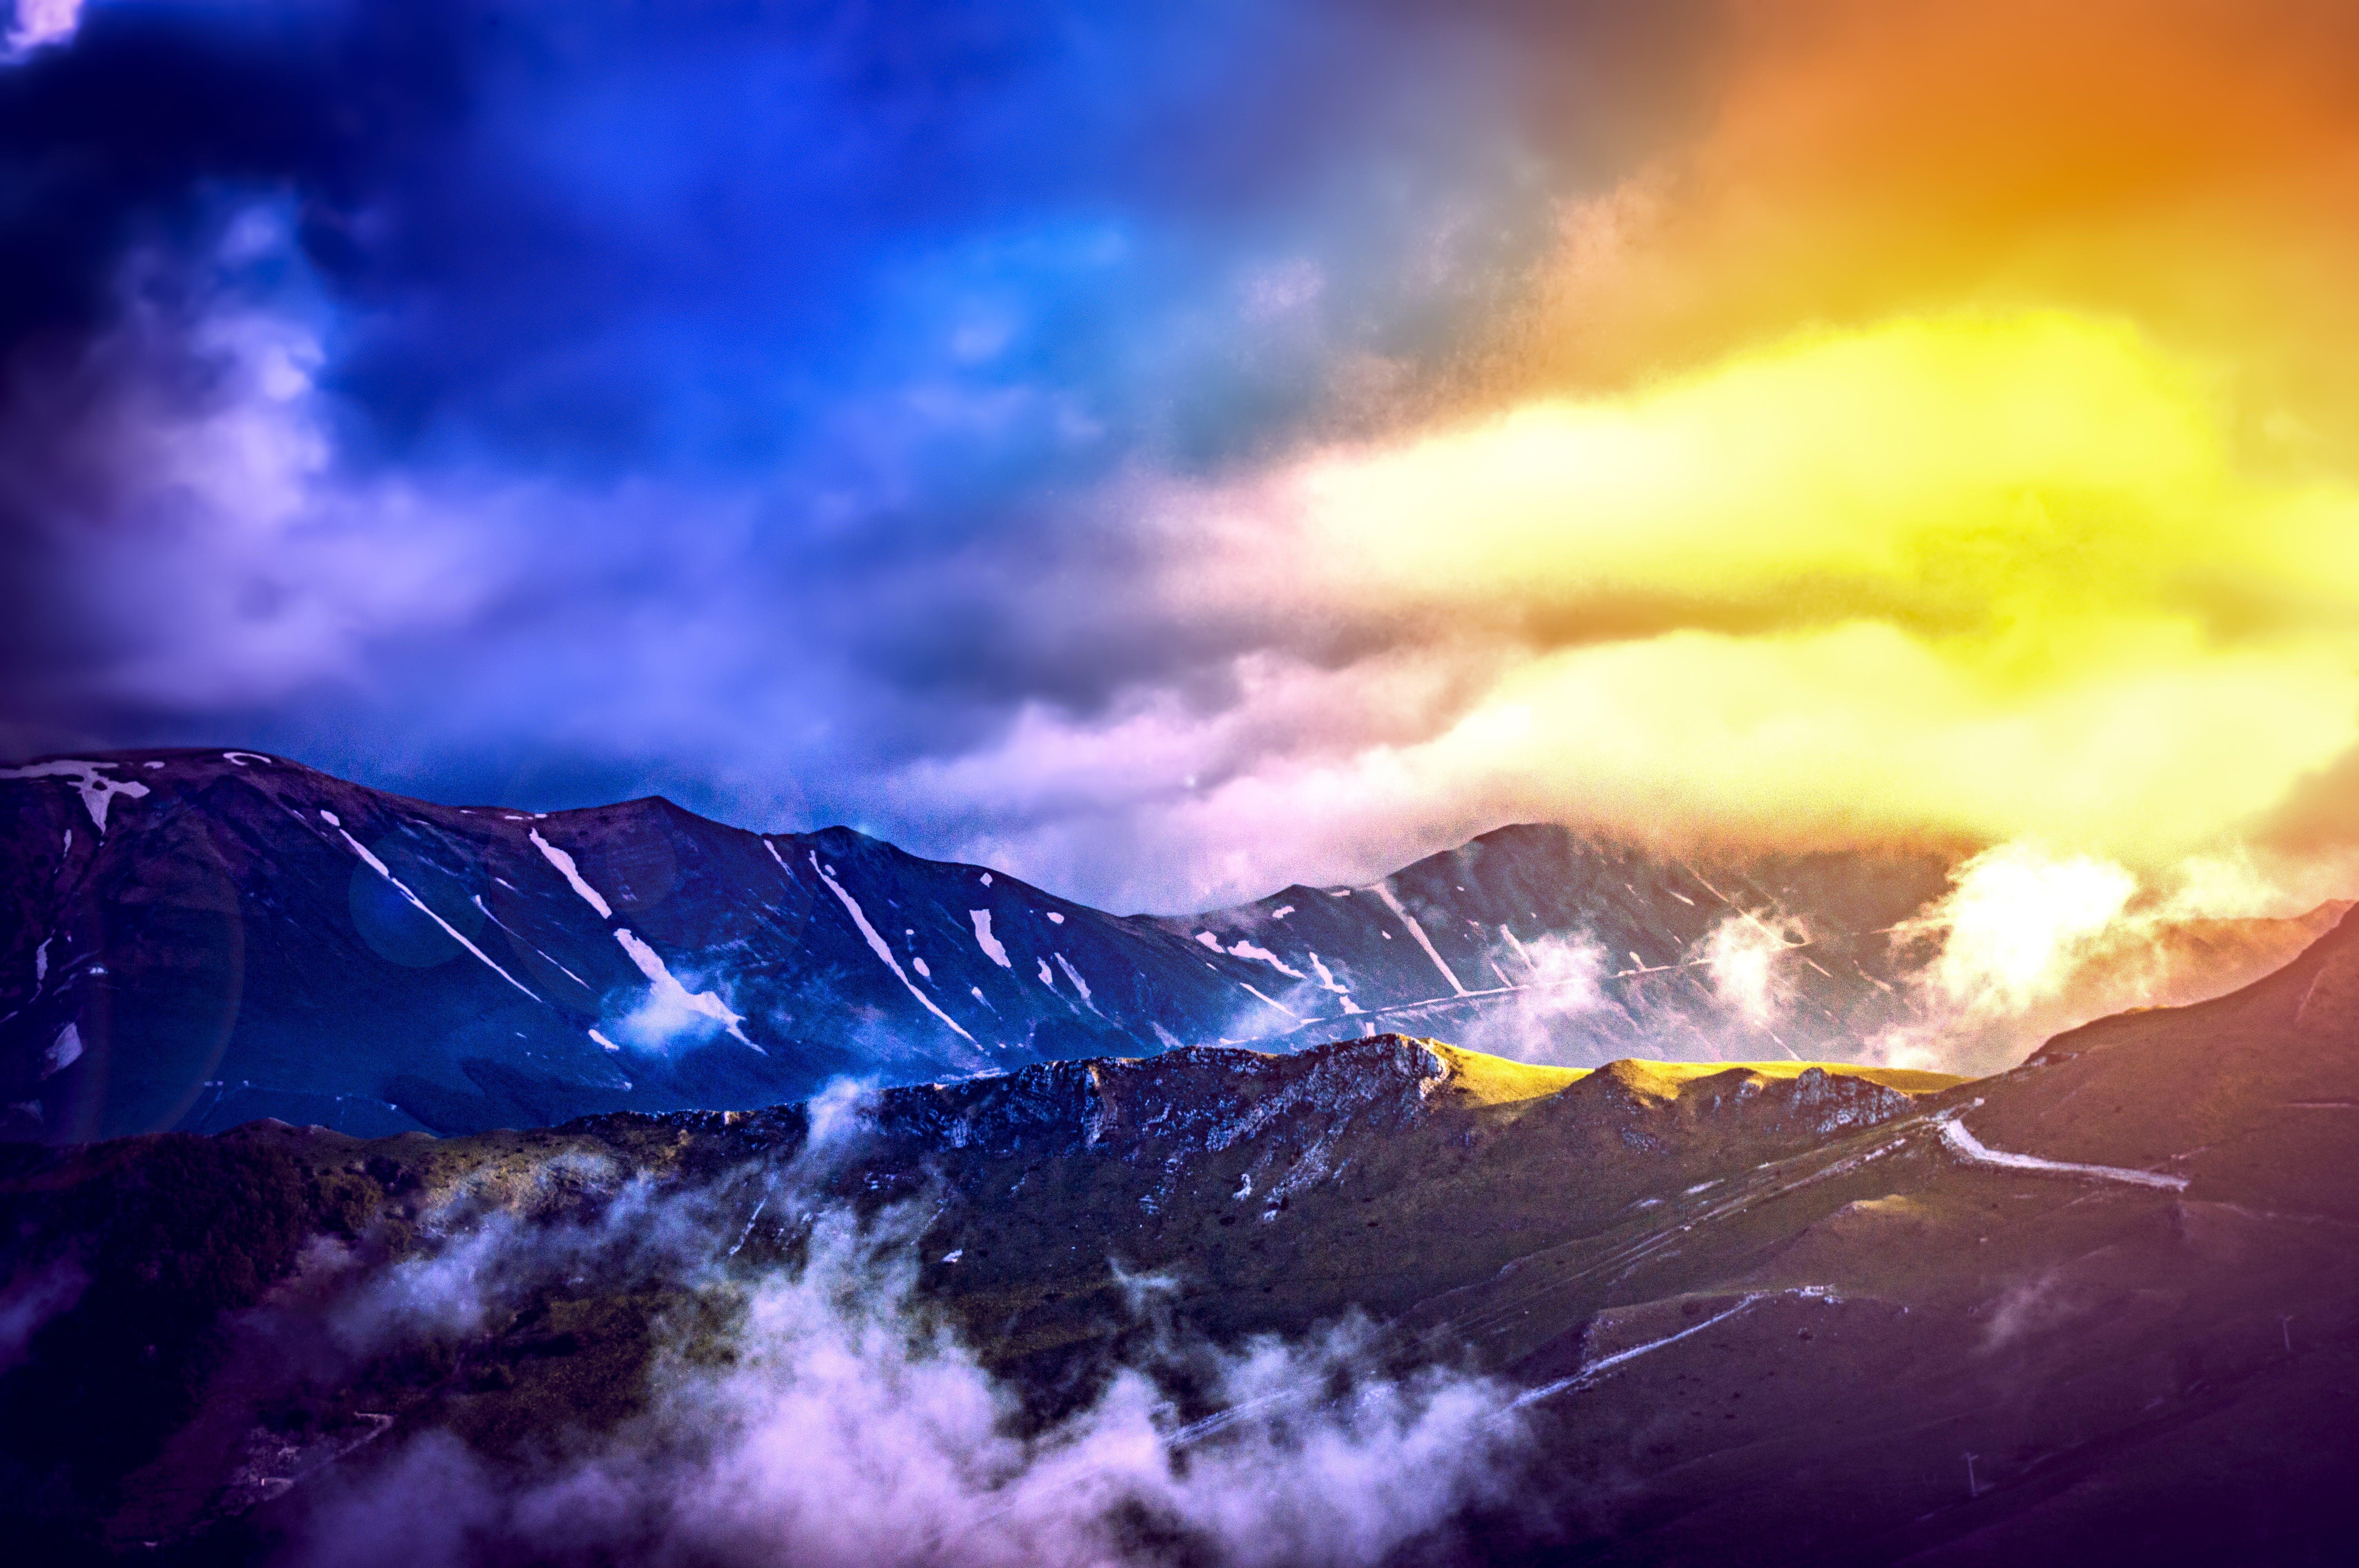 Kostnadsfri bild av berg, Sol, solnedgång